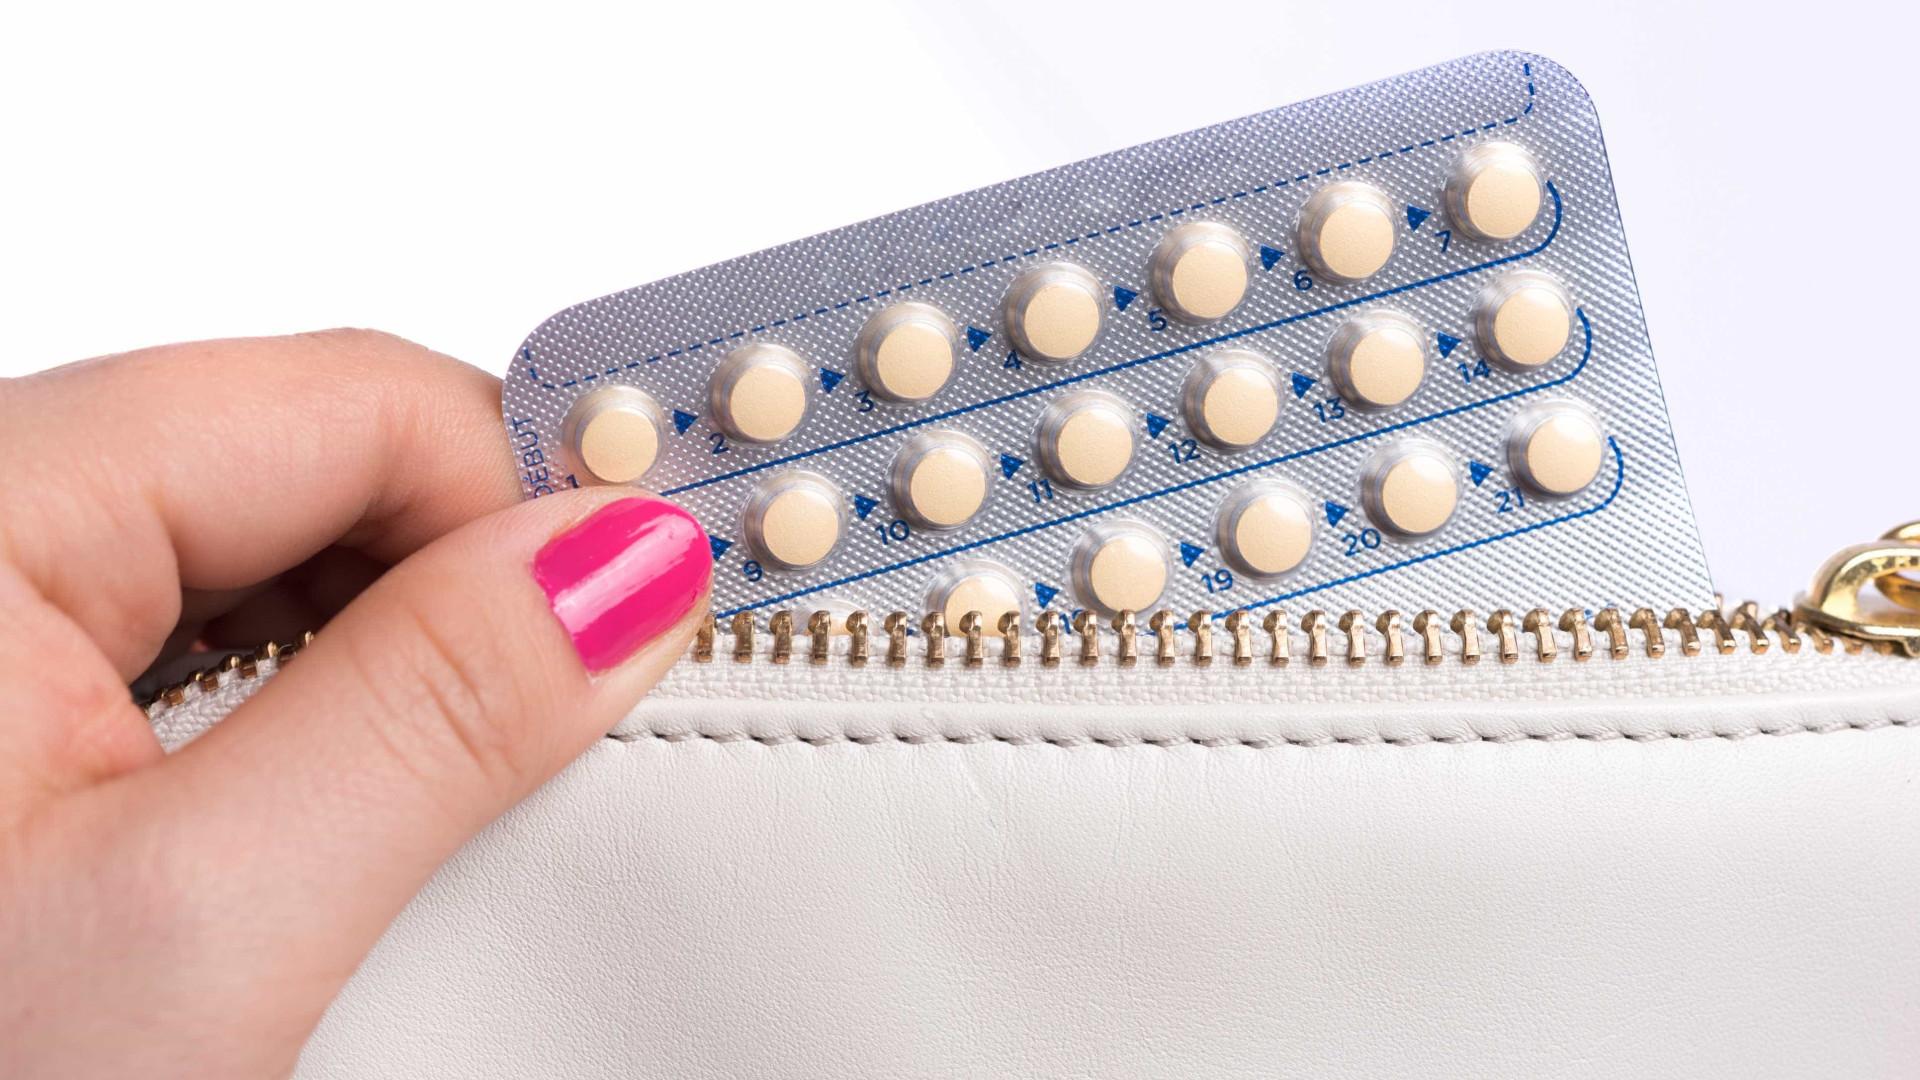 Pílula aumenta o risco de cancro da mama, diz estudo